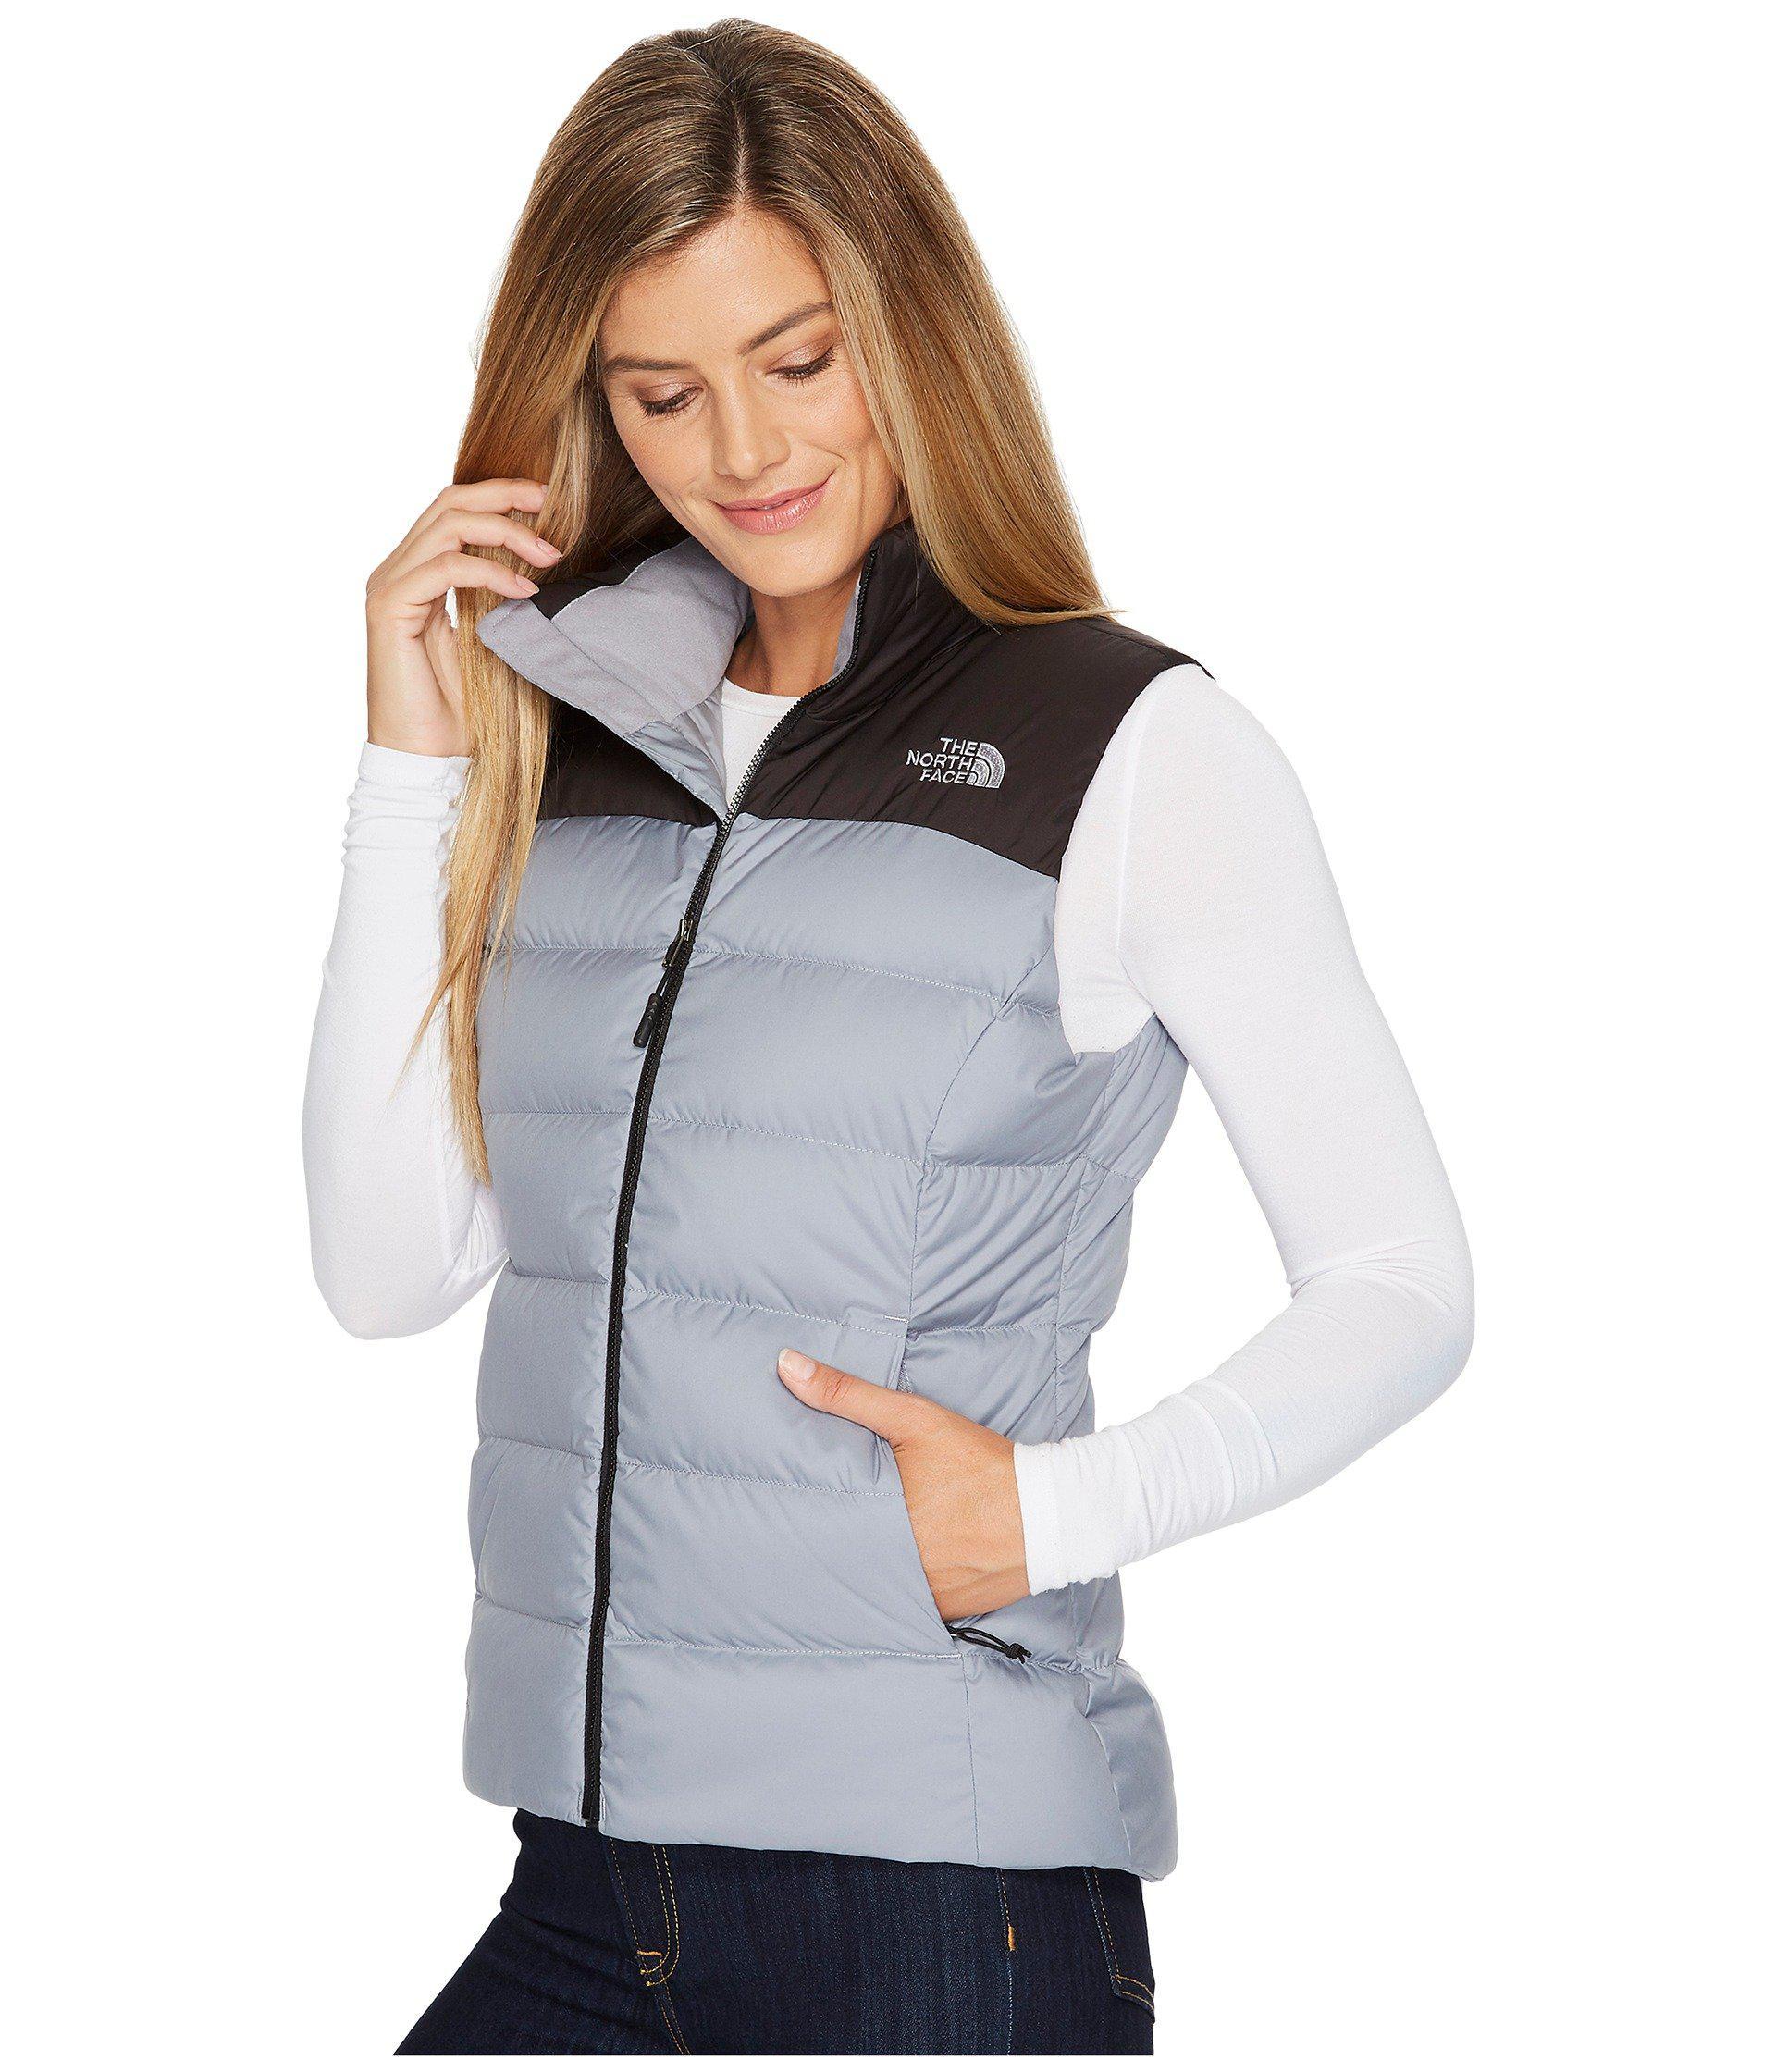 Lyst - The North Face Nuptse Vest (tnf White tnf Black) Women s Jacket in  Gray 052d0e208